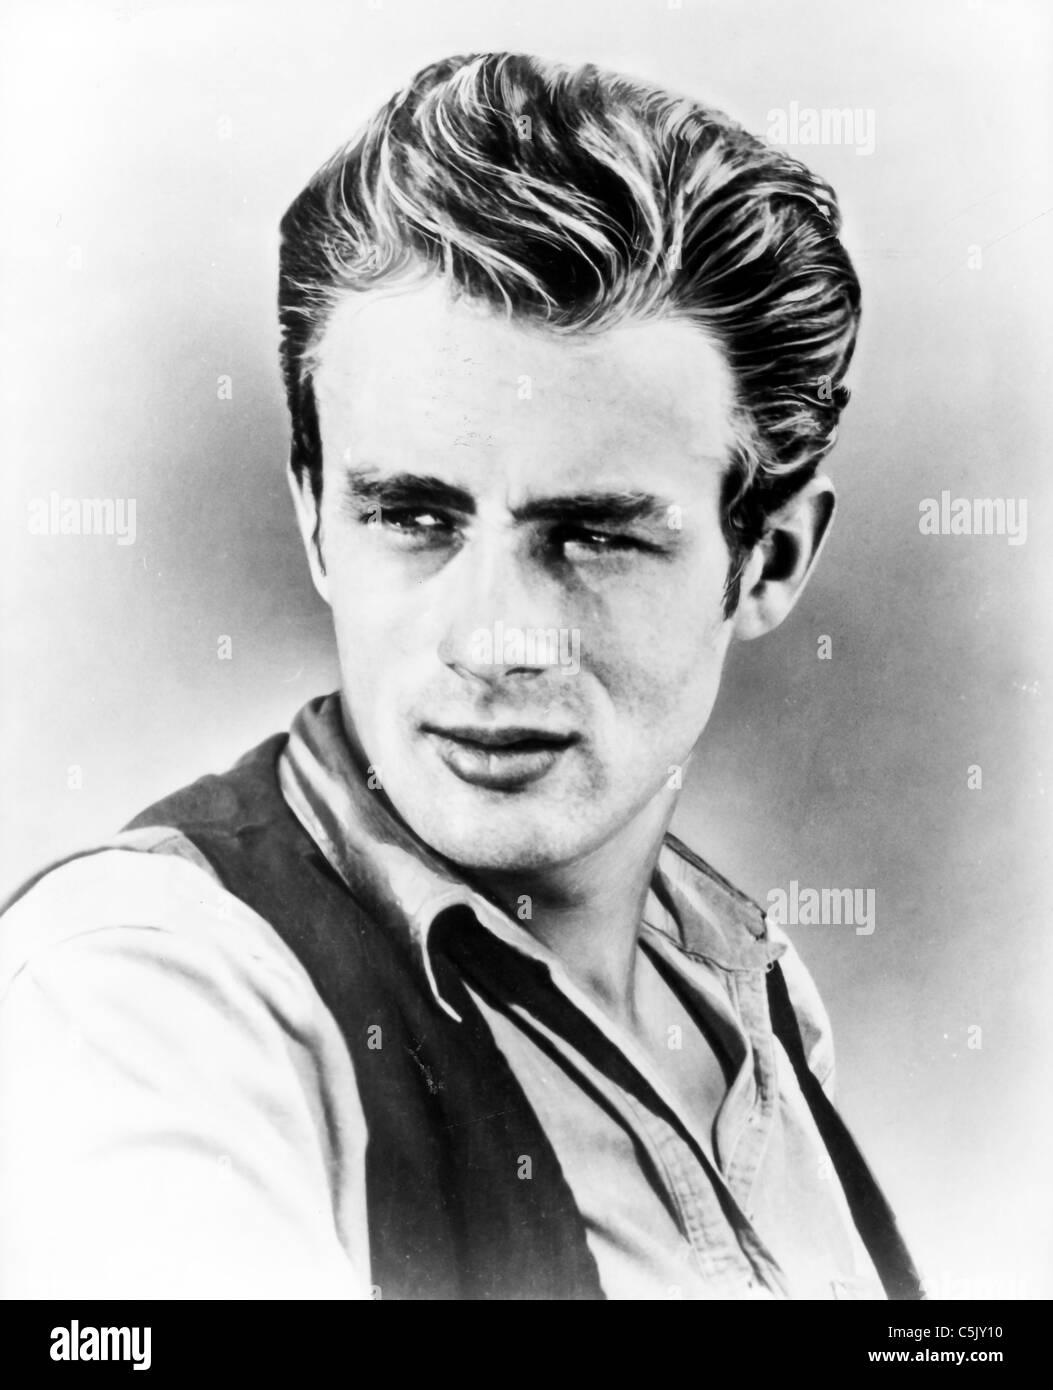 james dean giant, 1955 - Stock Image